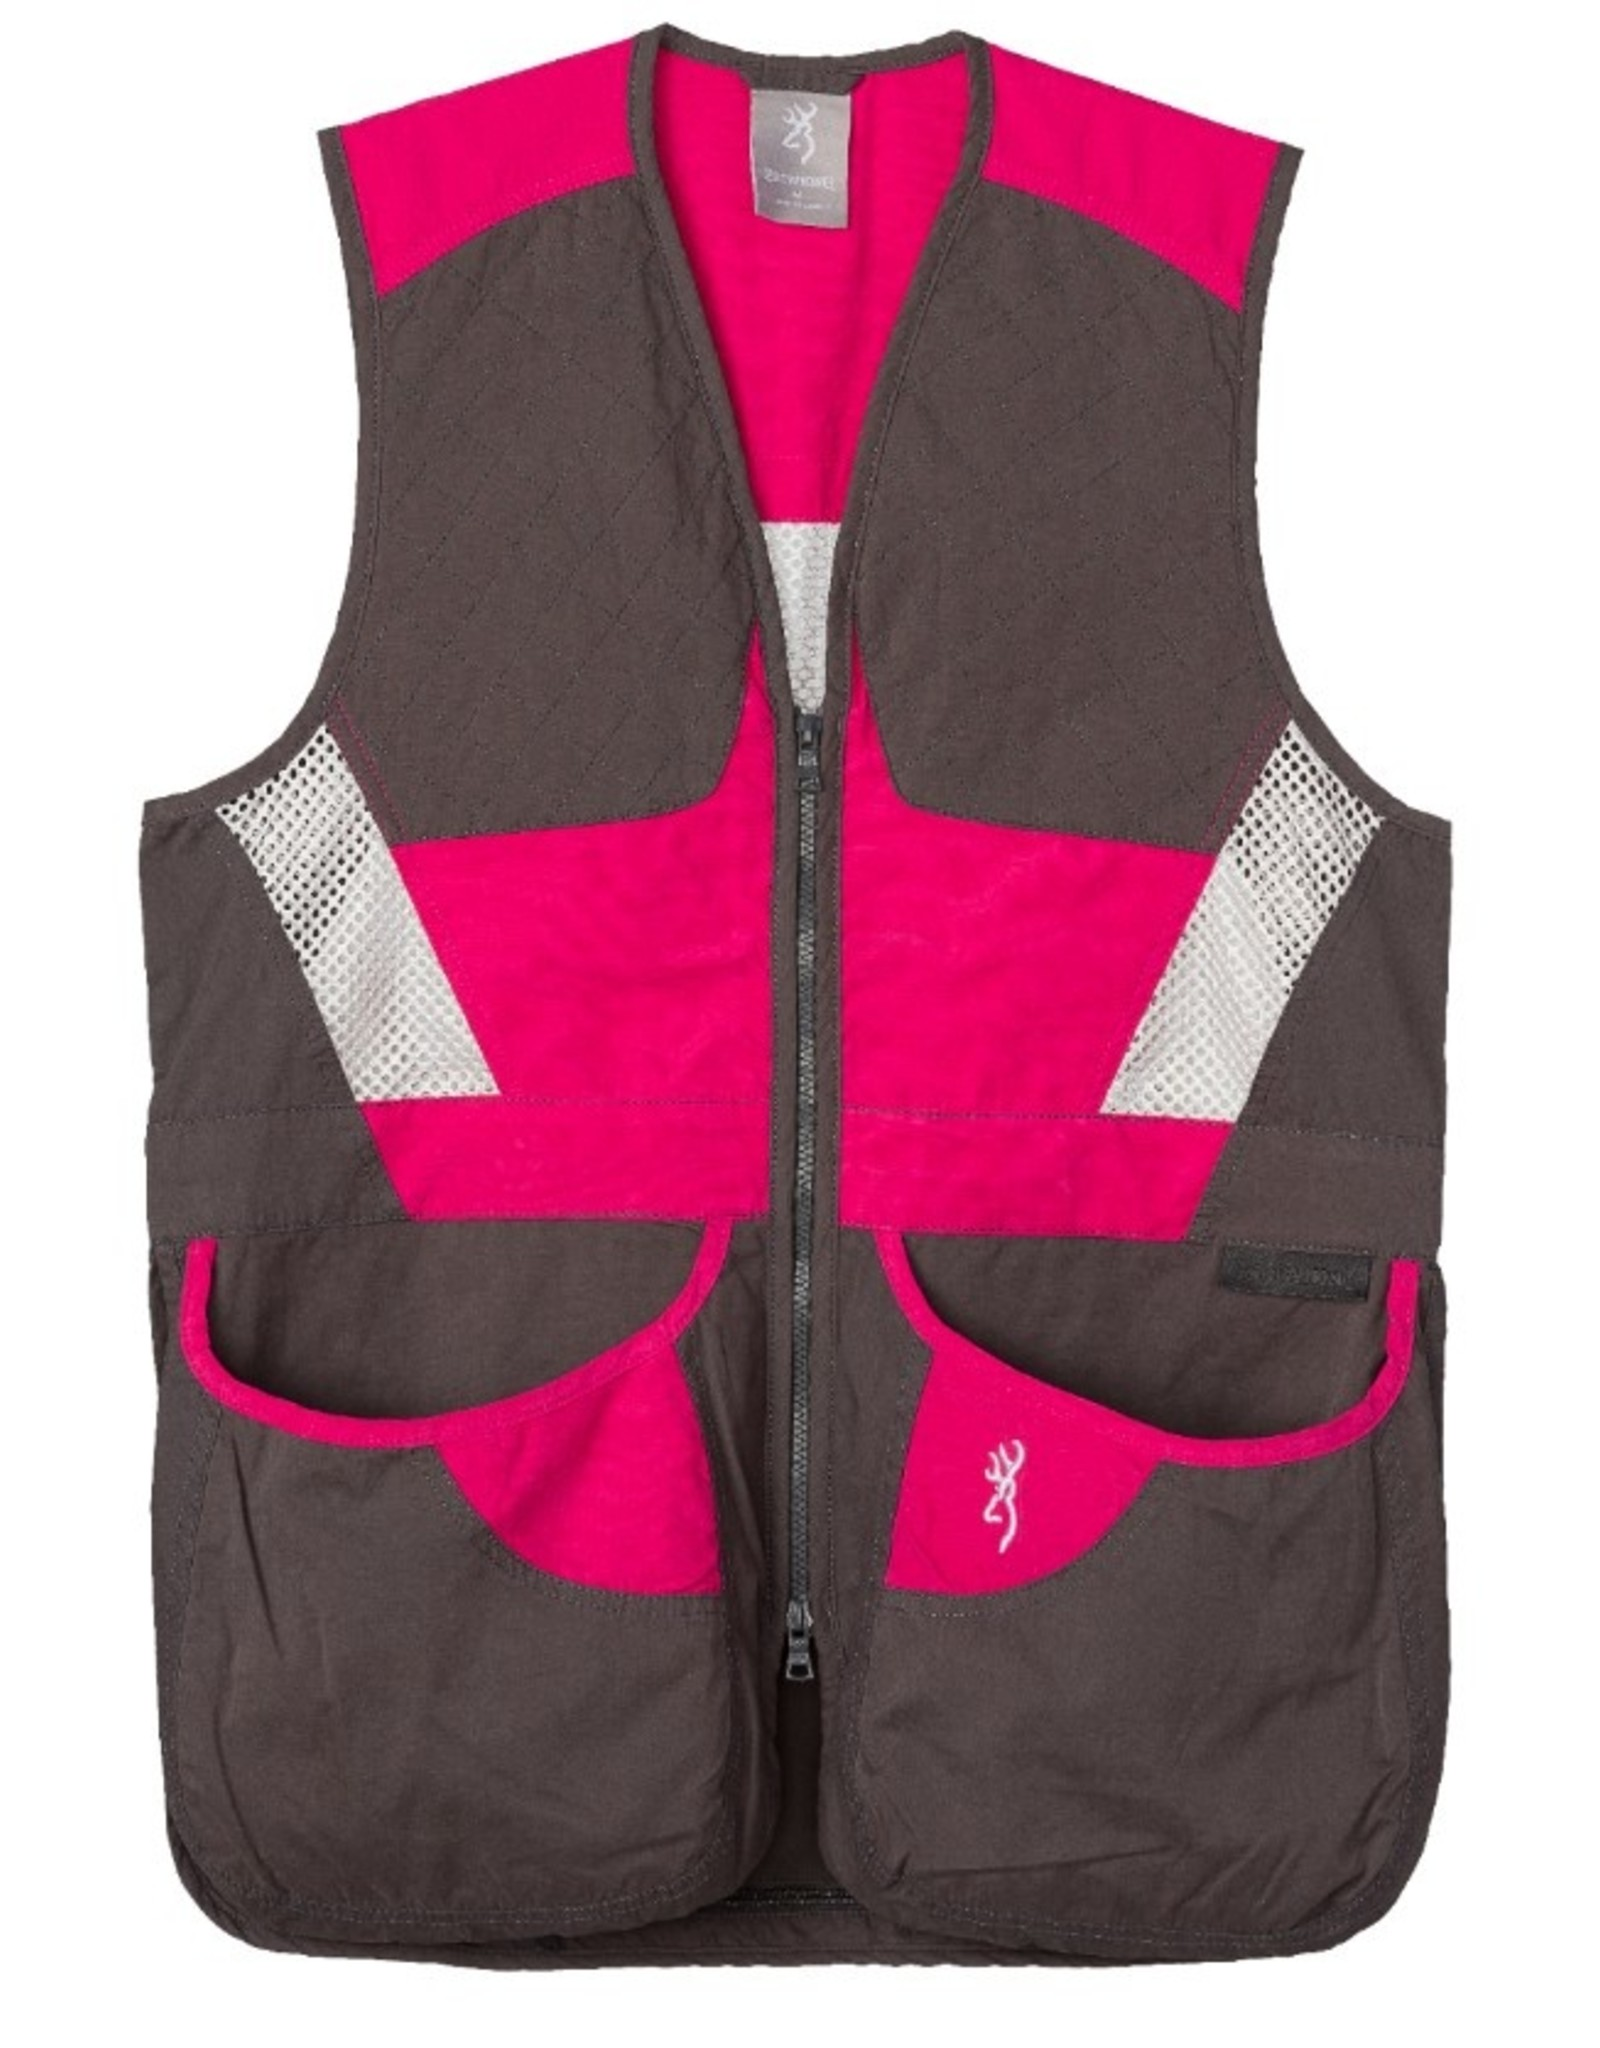 Browning Summit Vest Smoke/Hot Pink - MED